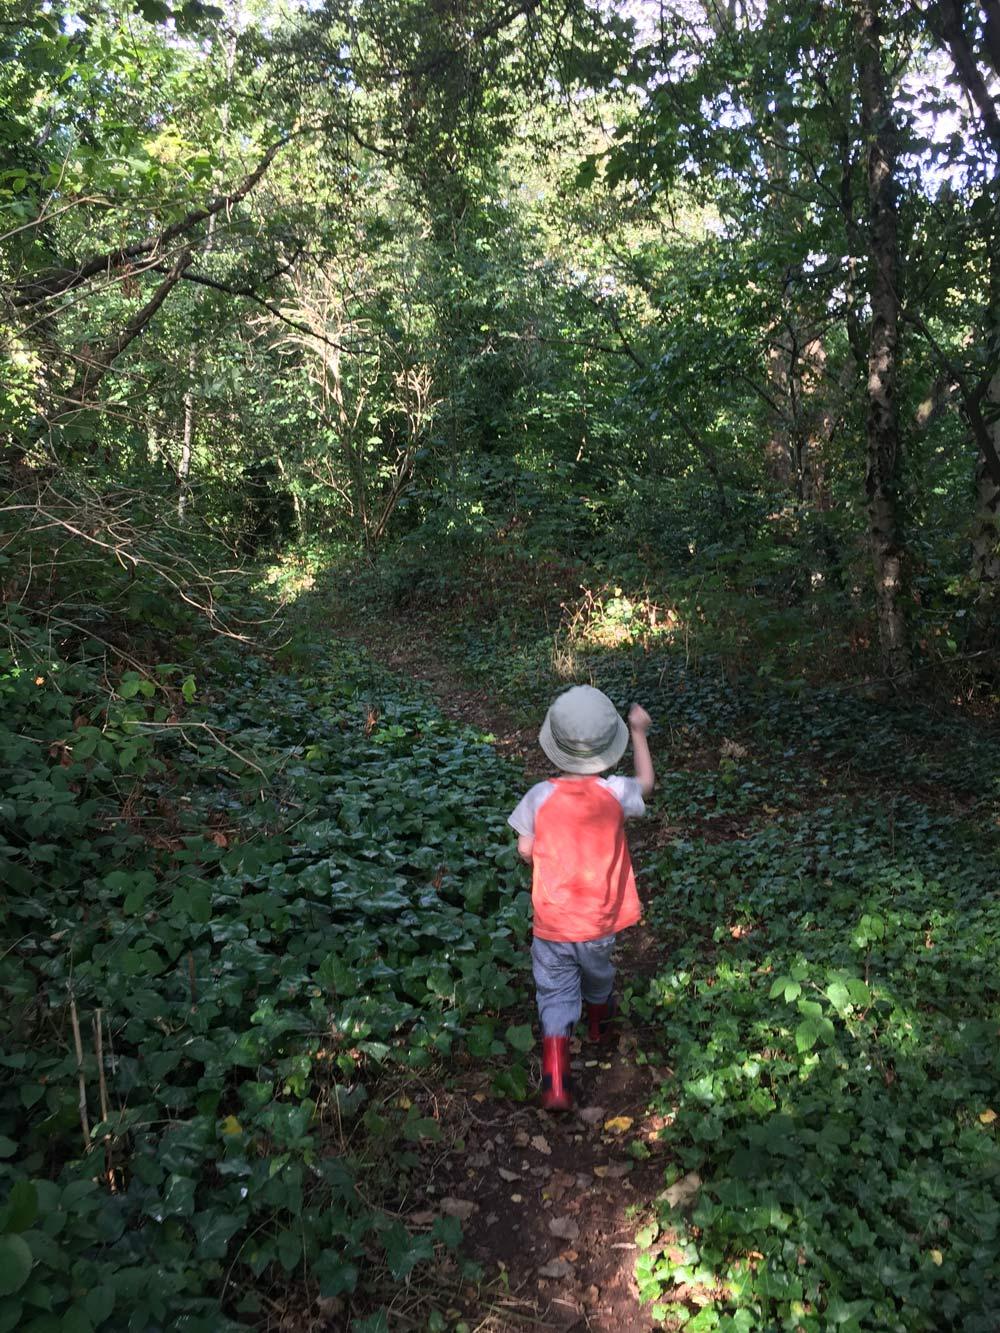 Path-brokley-nature-gojauntly-blog-hana-2016